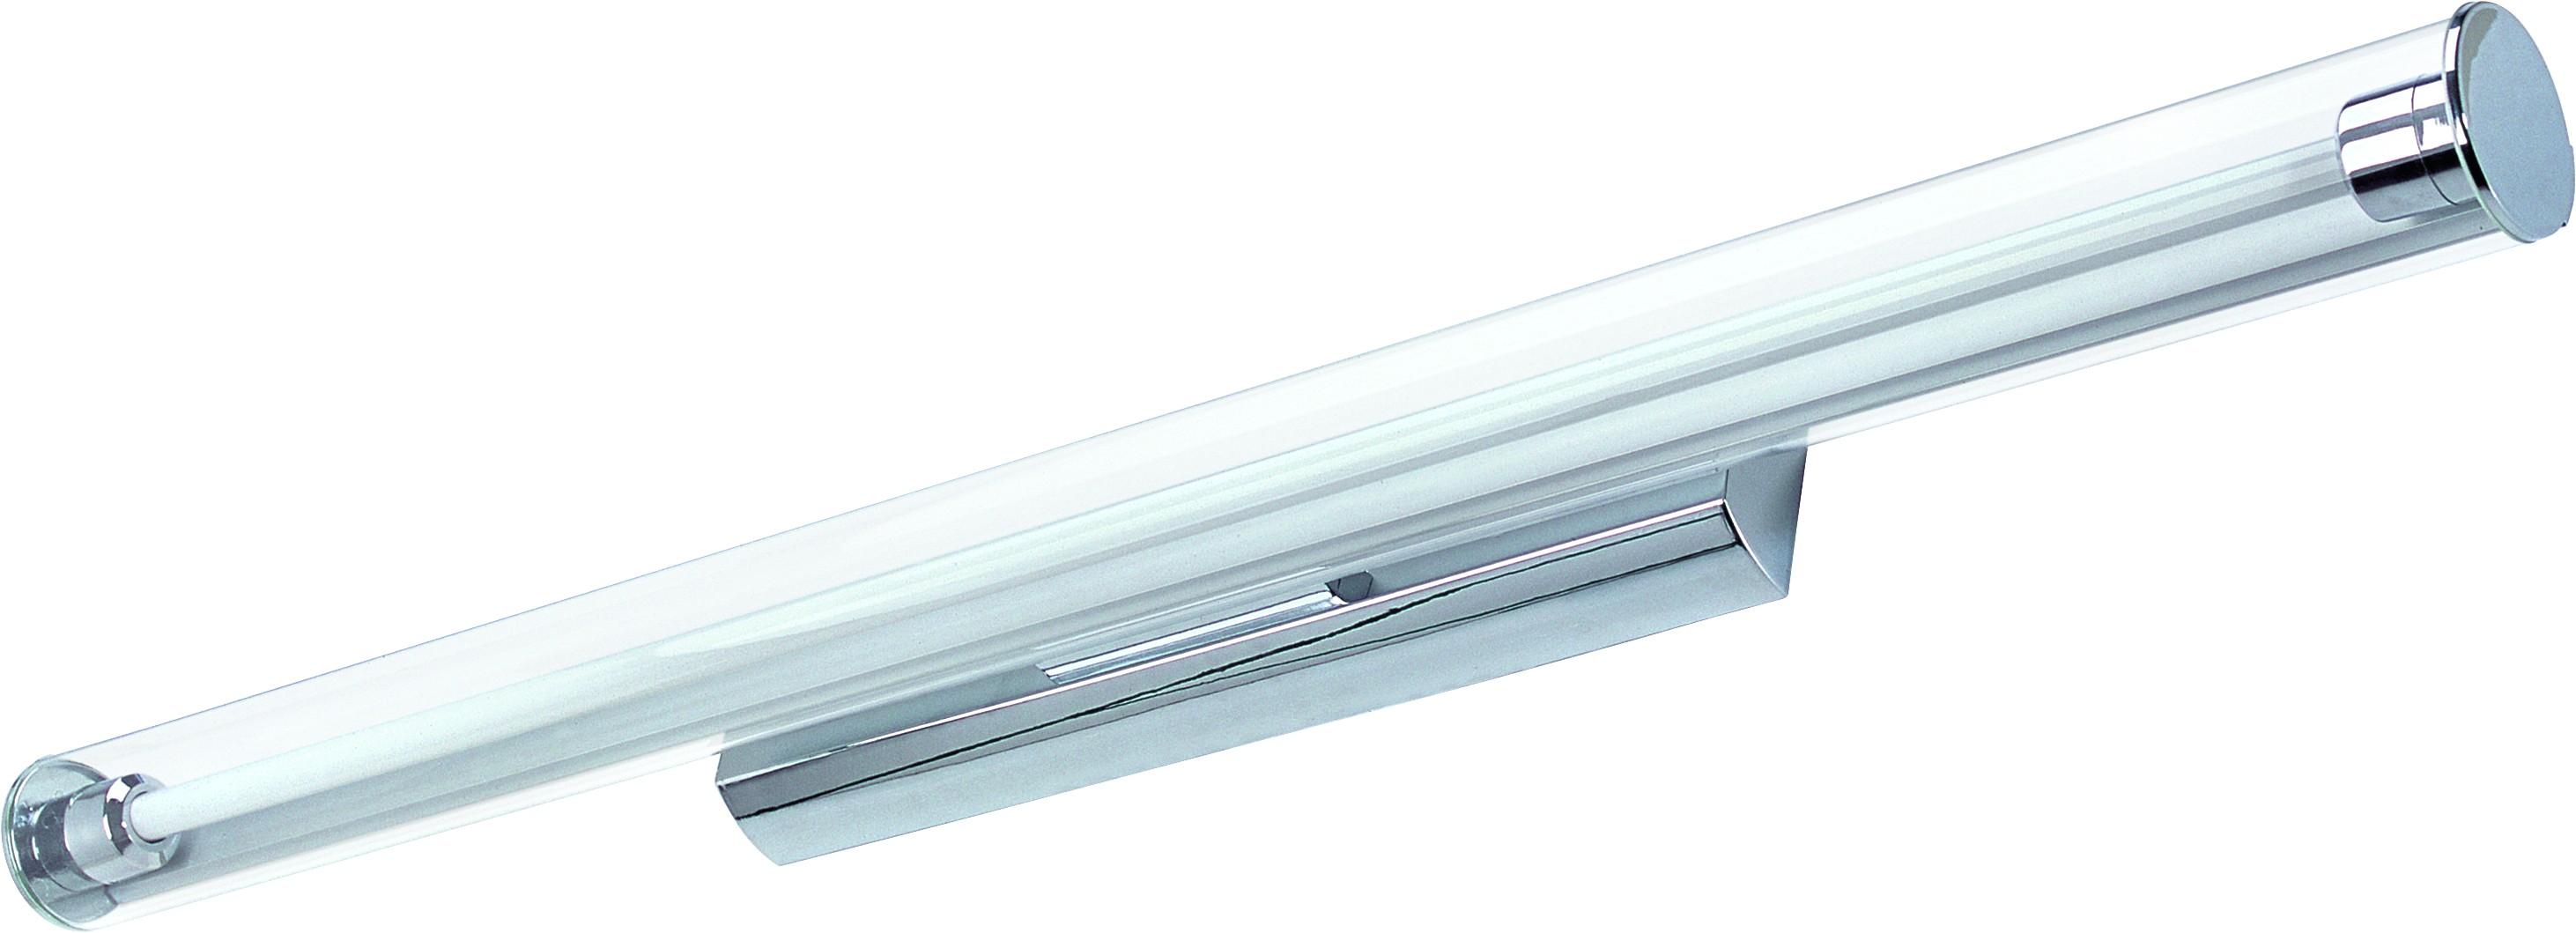 Подсветка для картин Arte lamp A1318ap-1cc